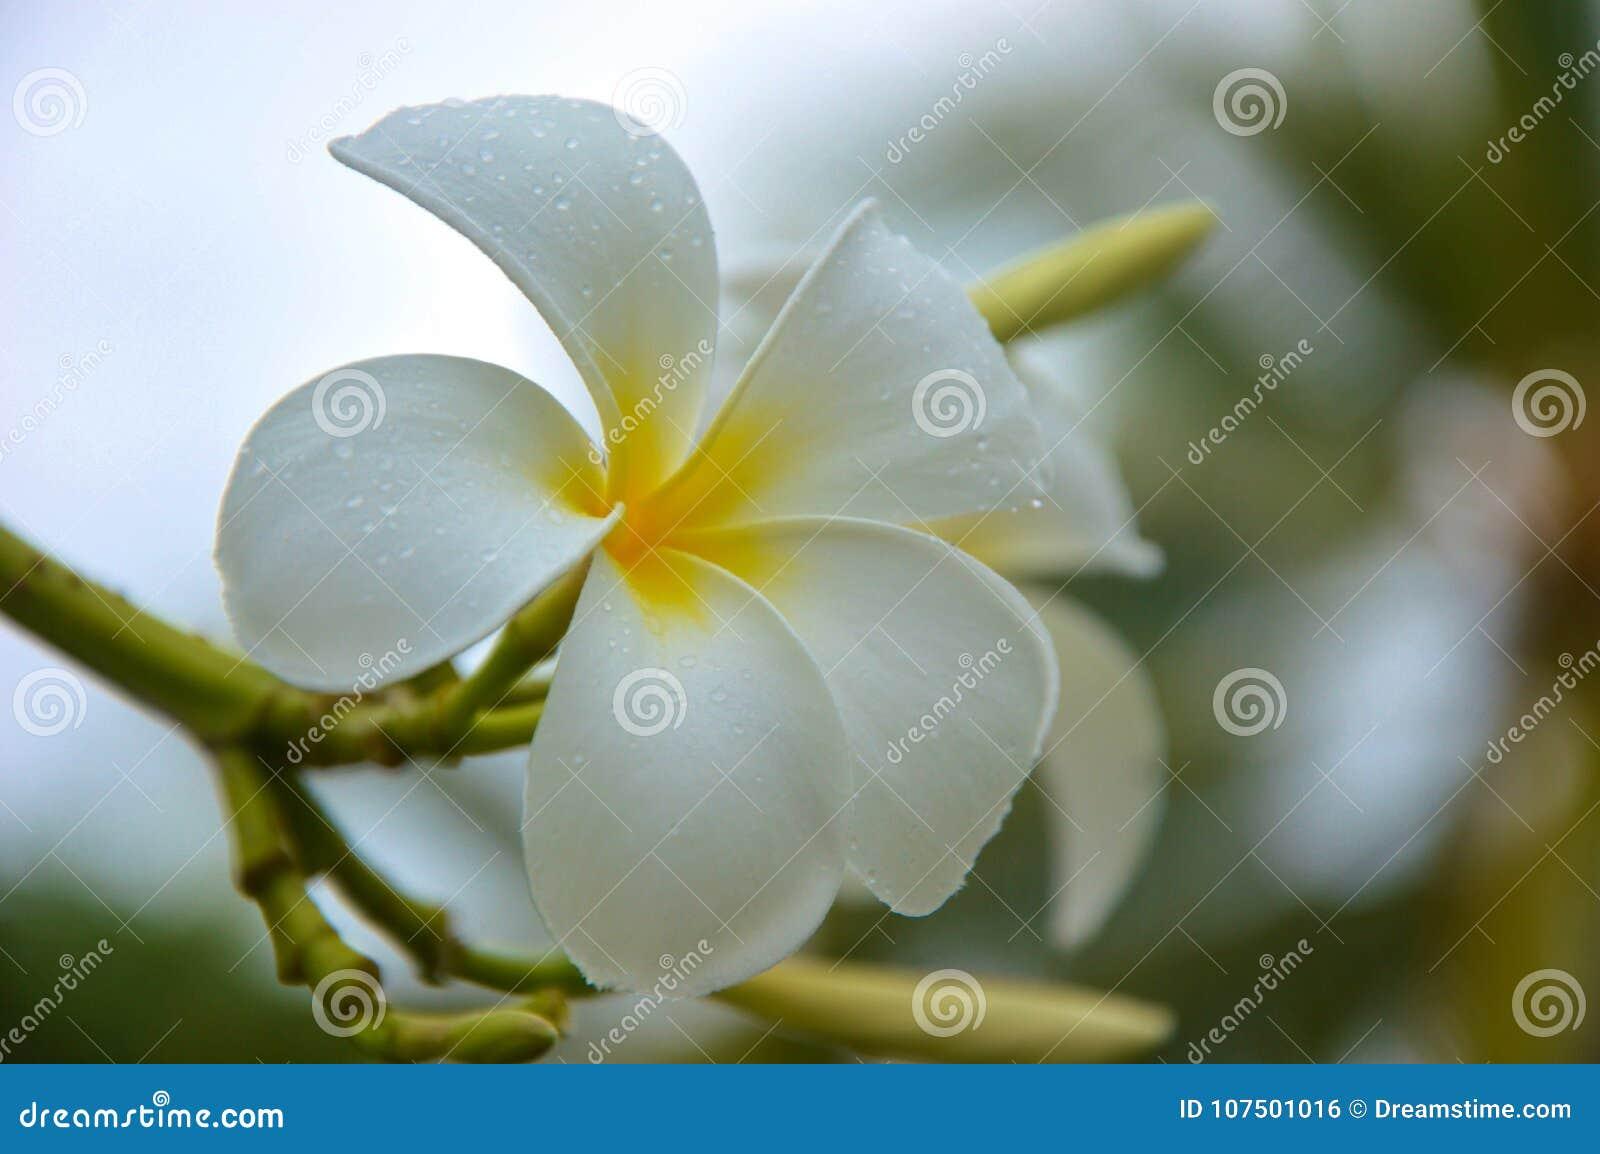 Nature flower white beauty flora bloom tree freshness dew stock nature flower white beauty flora bloom tree freshness dew izmirmasajfo